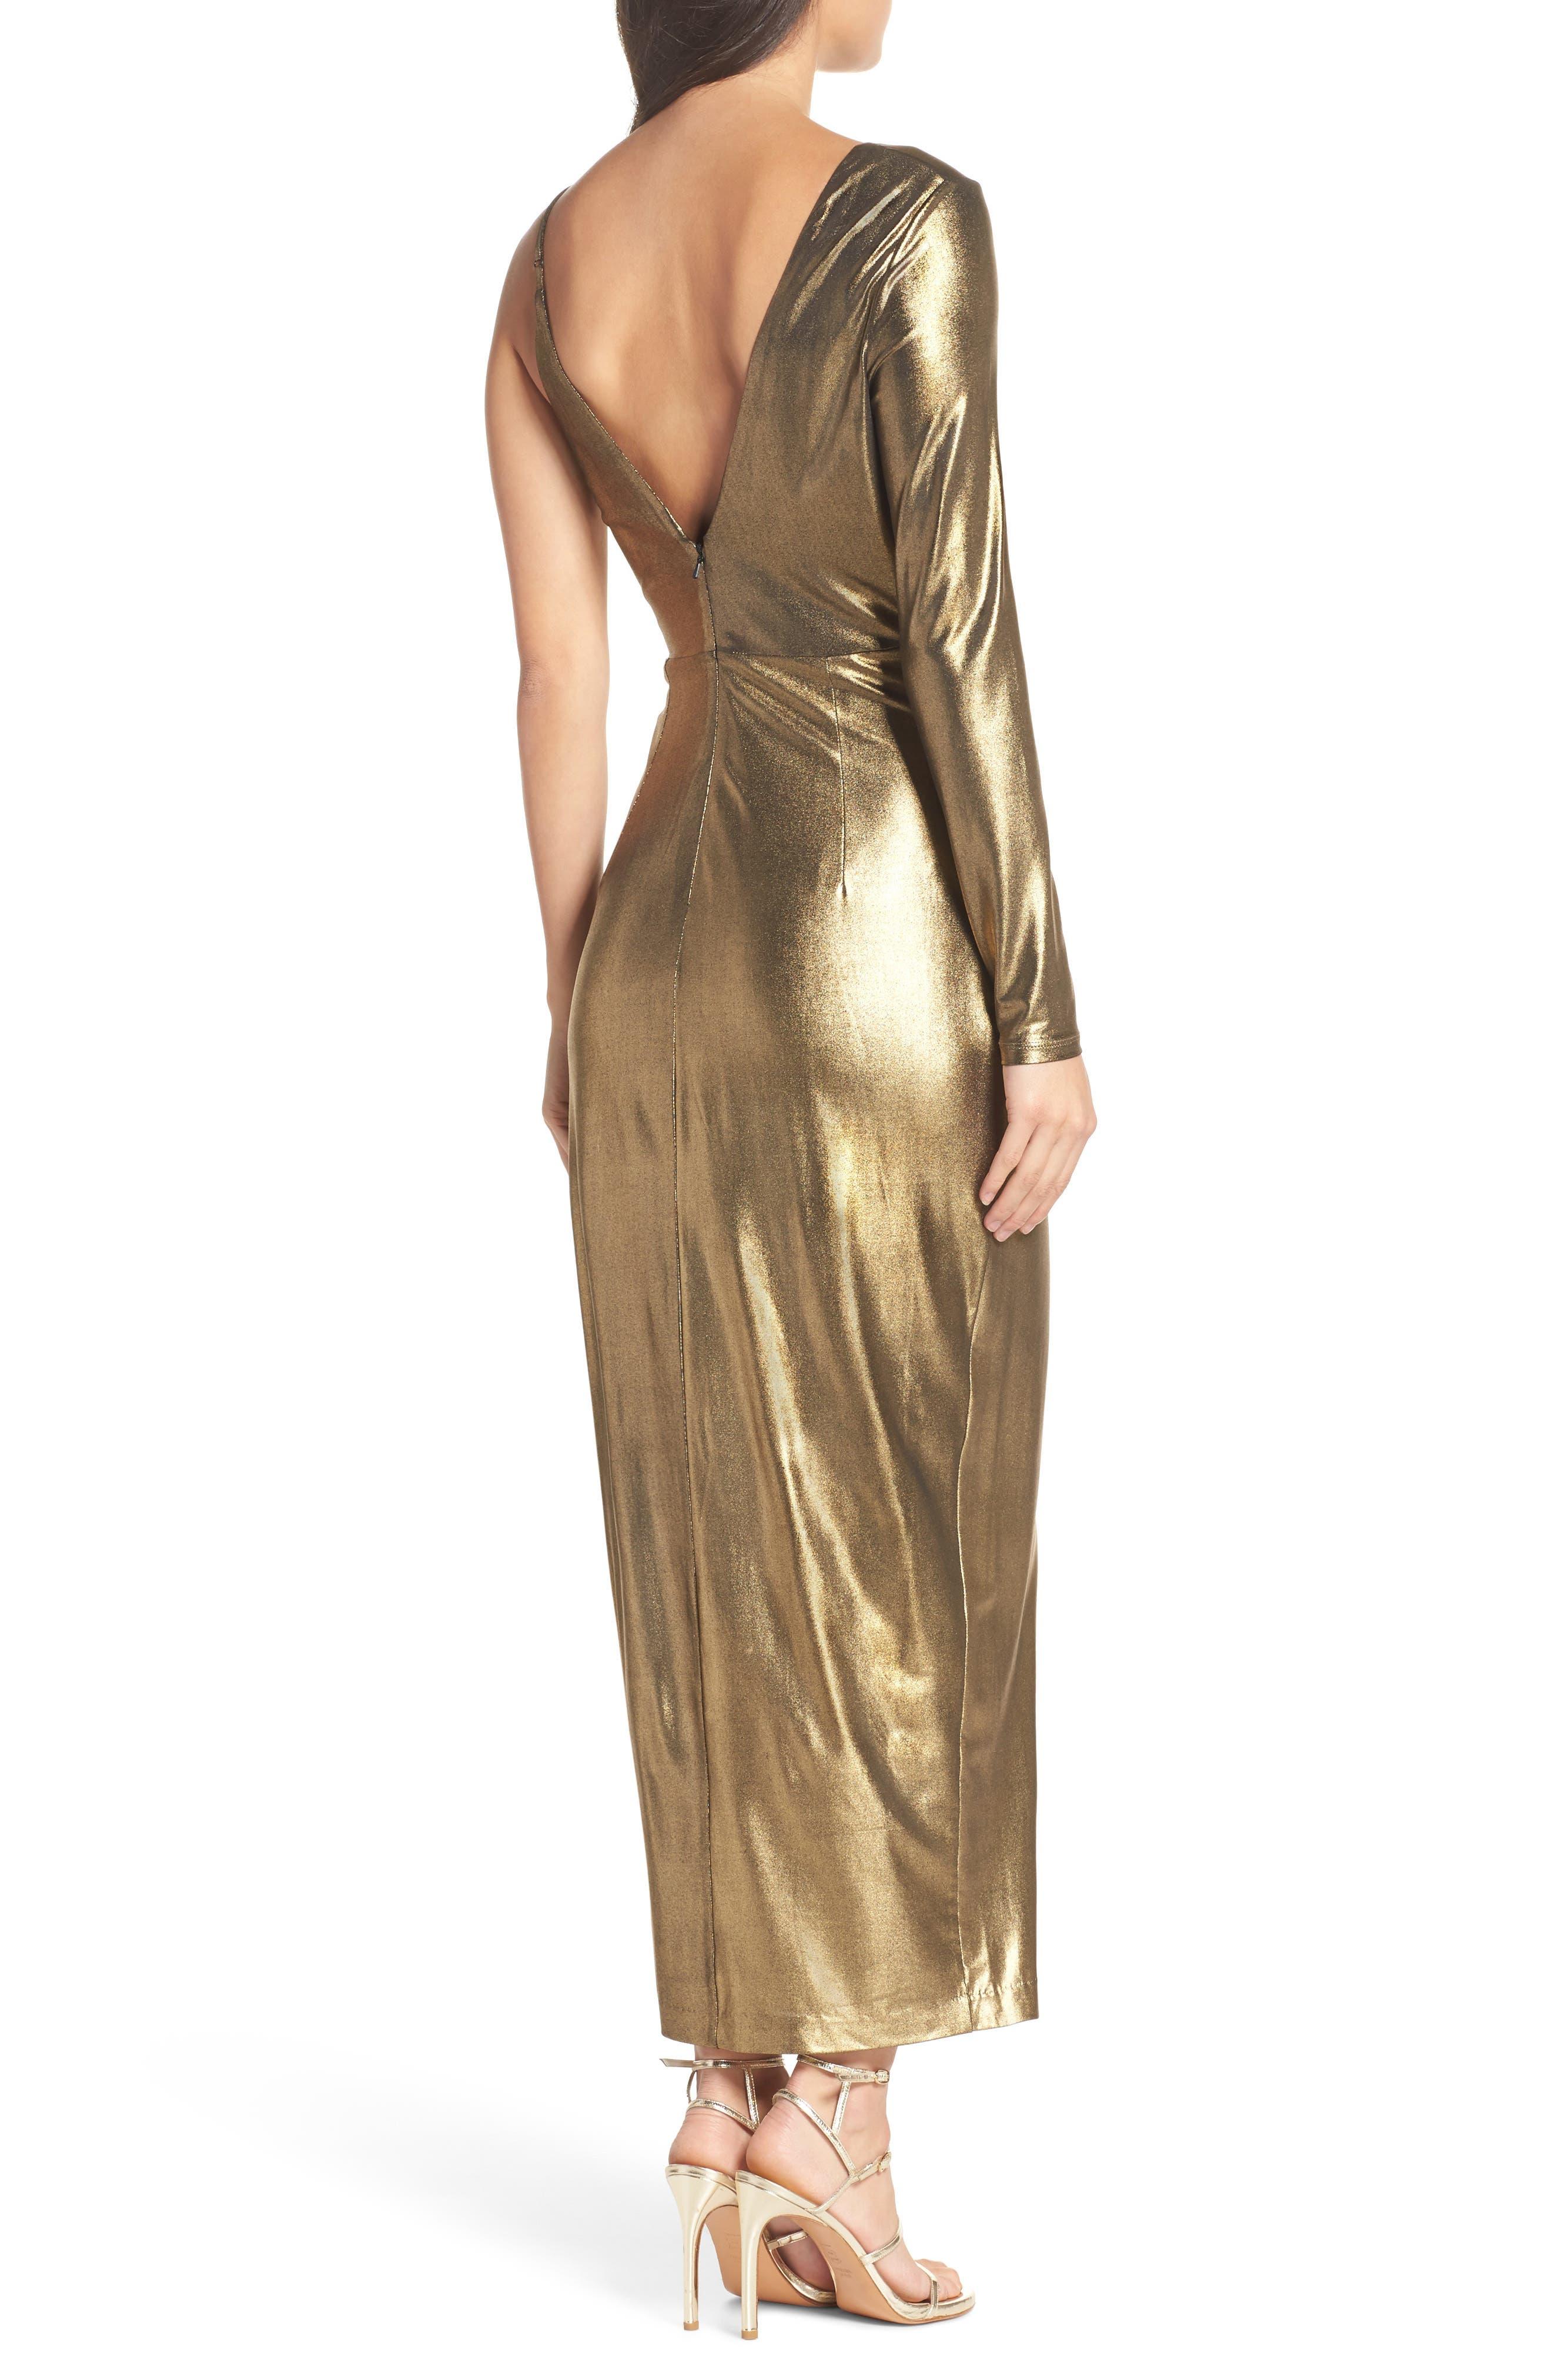 Aurel Metallic Dress,                             Alternate thumbnail 2, color,